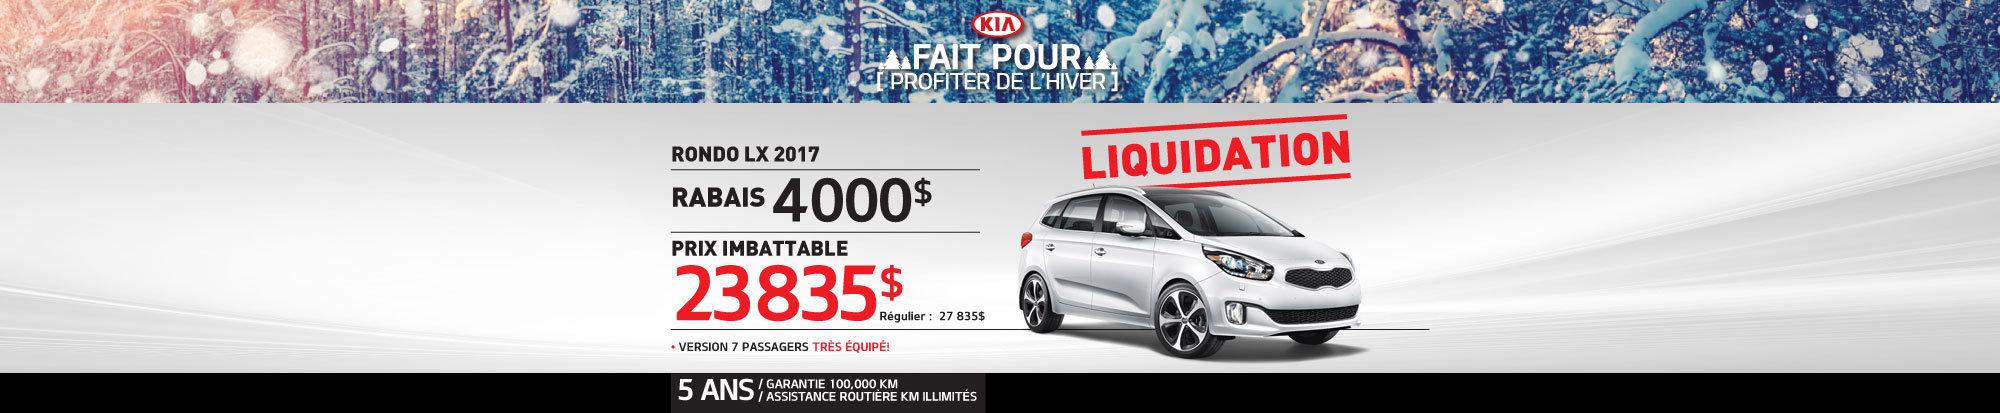 Liquidation Rondo 2017 web